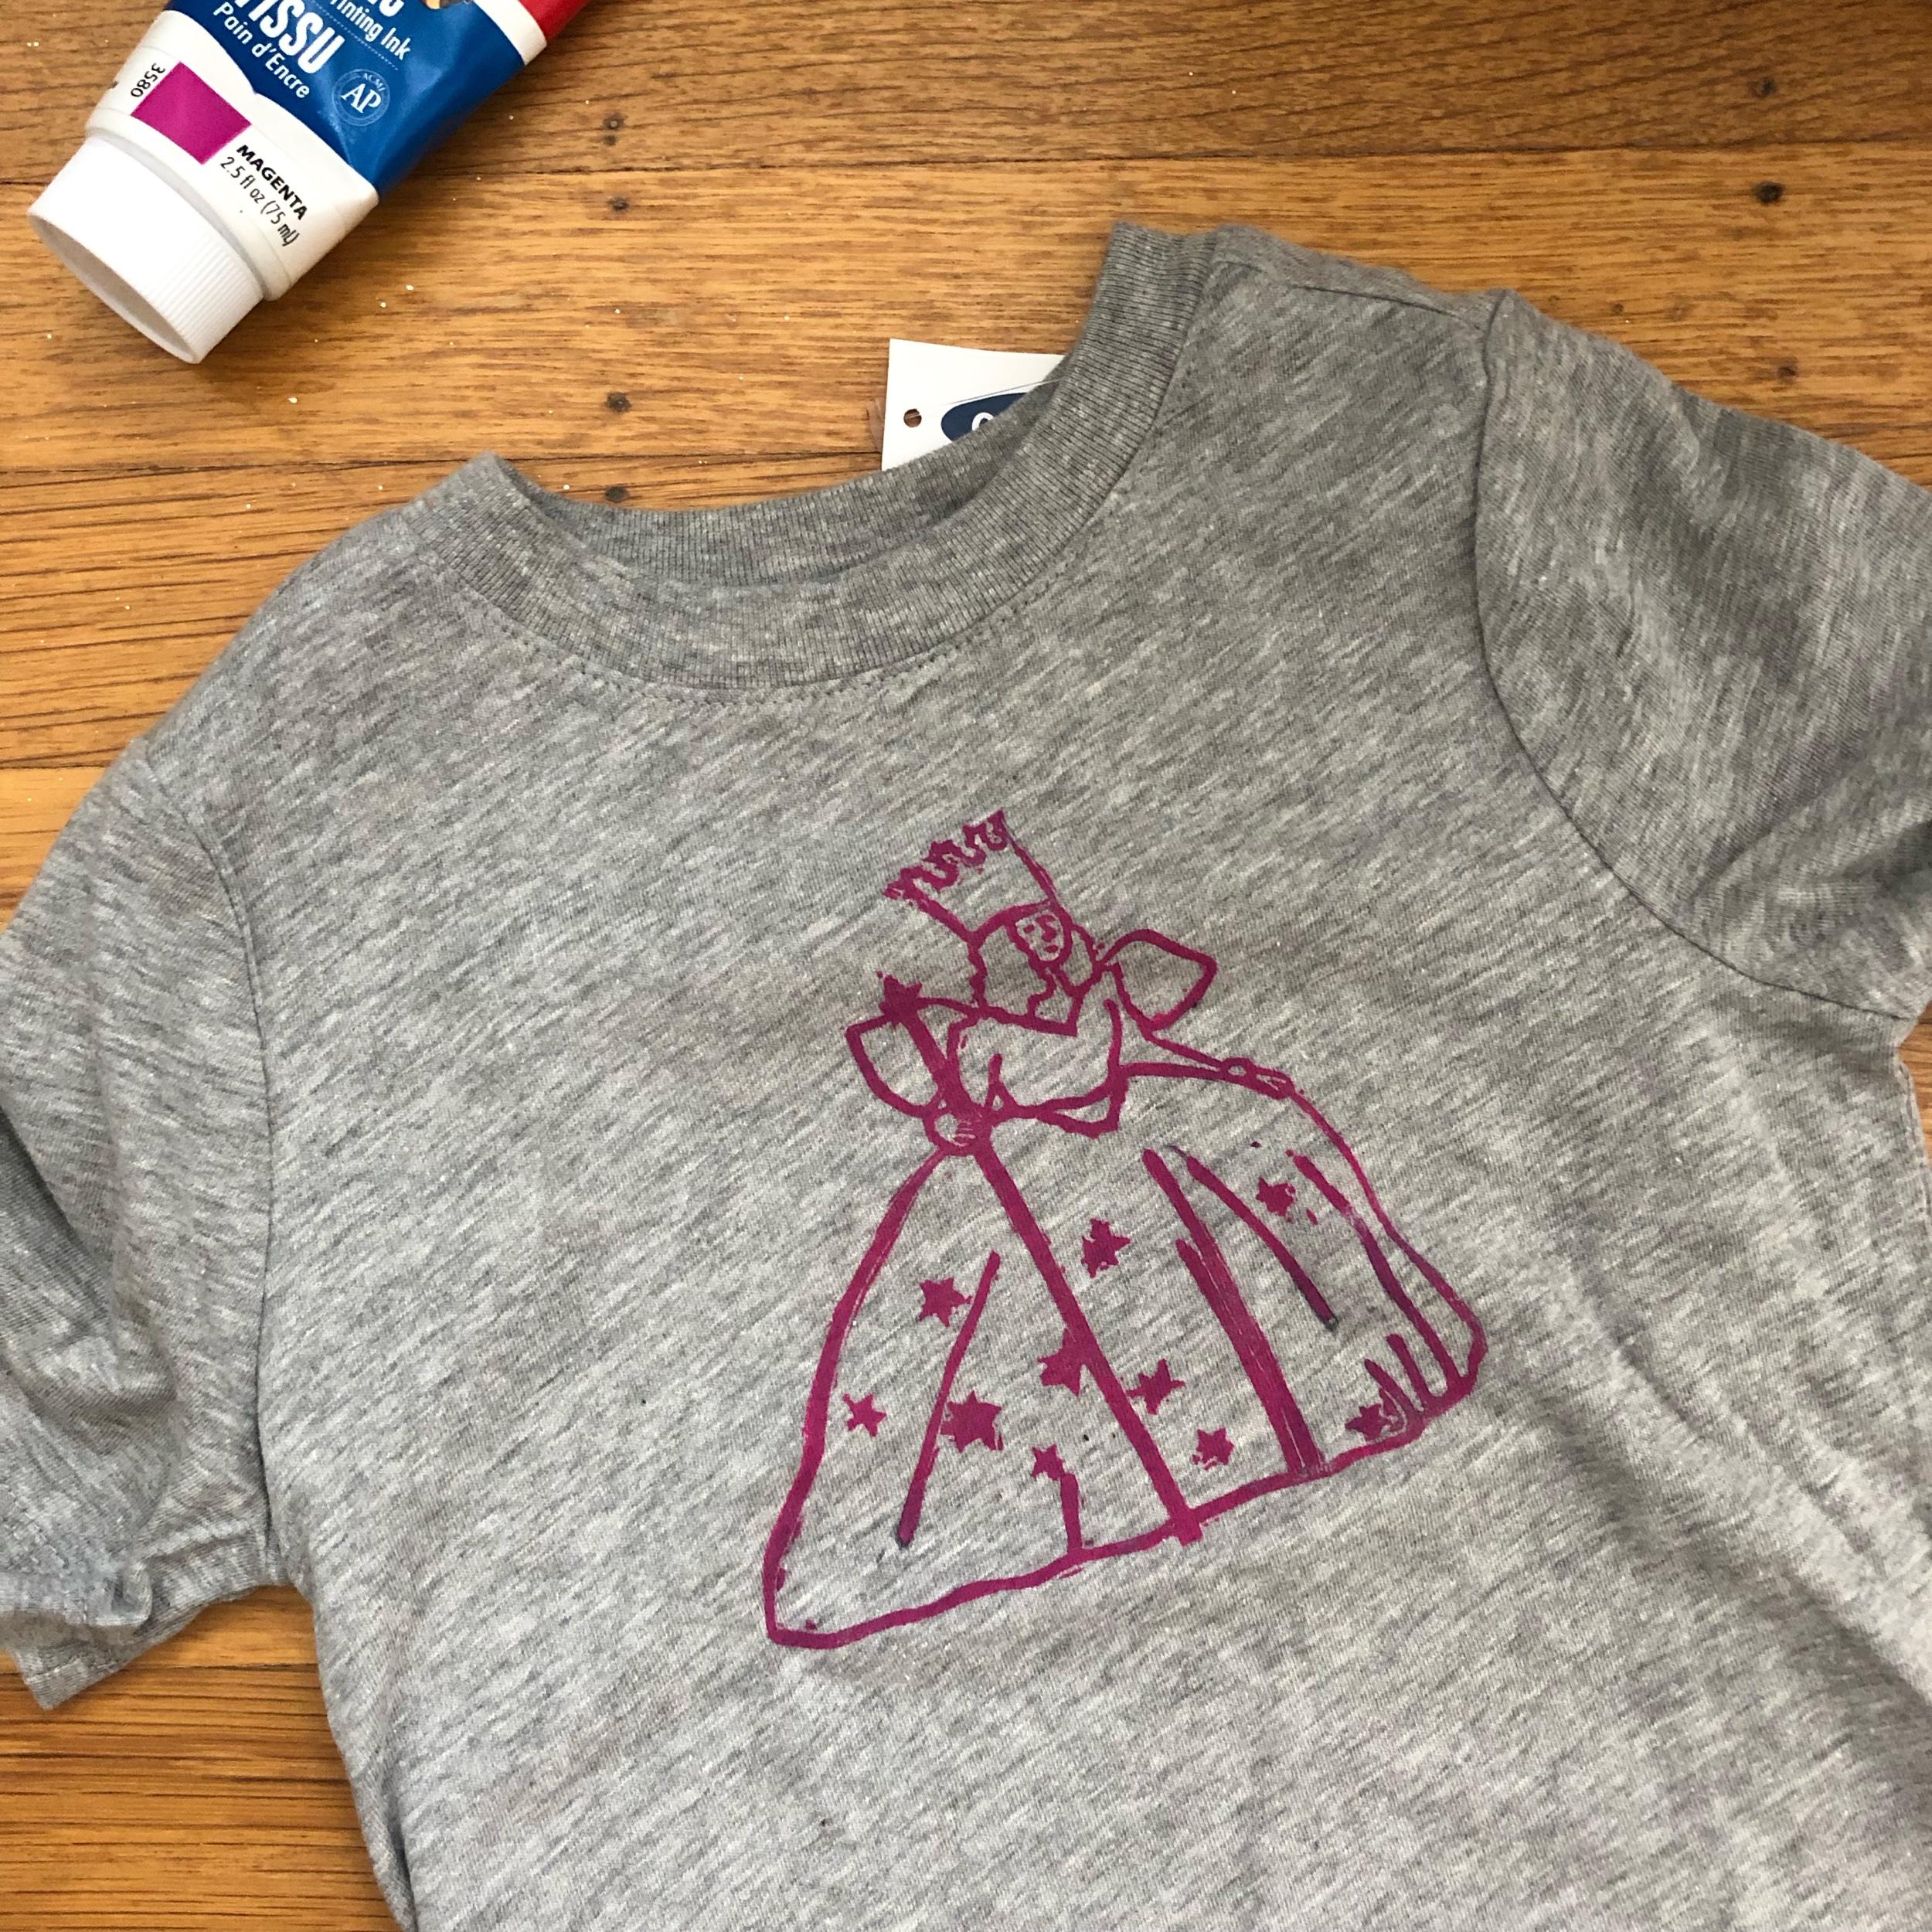 kushins_wizard_of_oz_glinda_stamp_shirt.jpeg